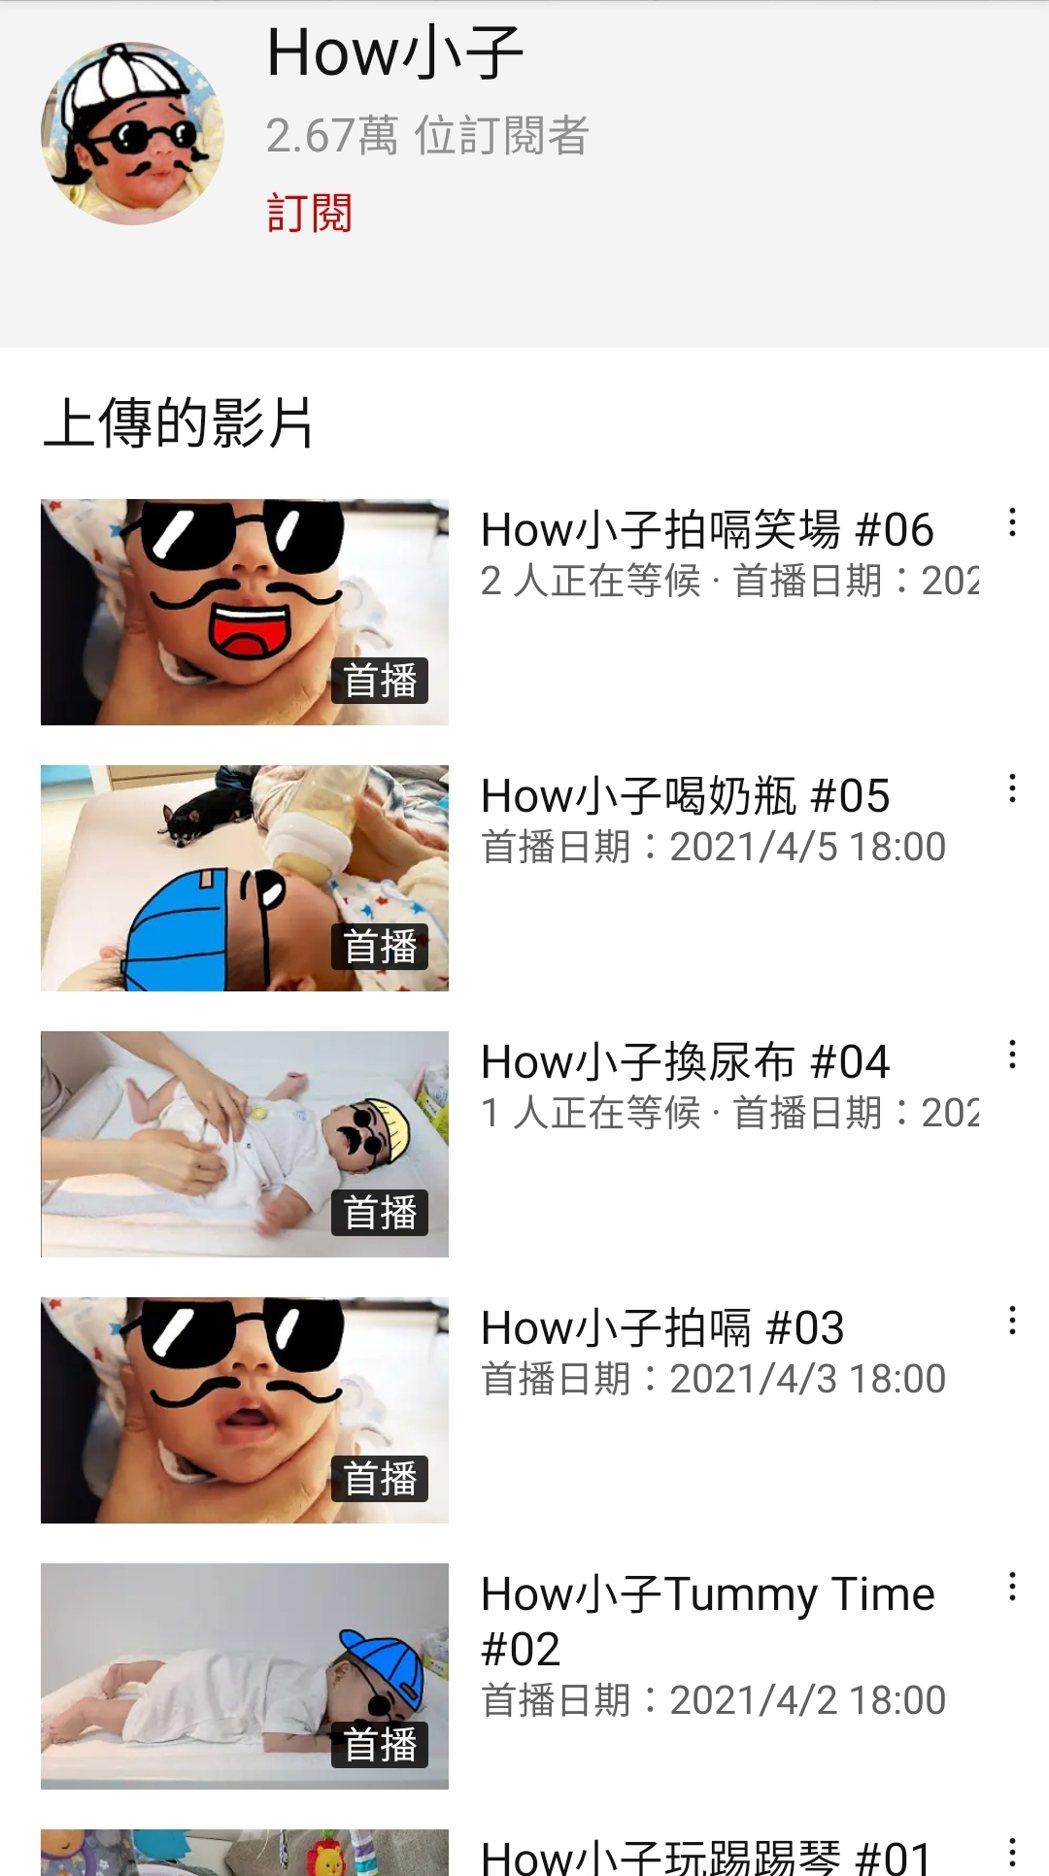 HowHow宣告要為兒子開設新頻道。 圖/擷自Youtube